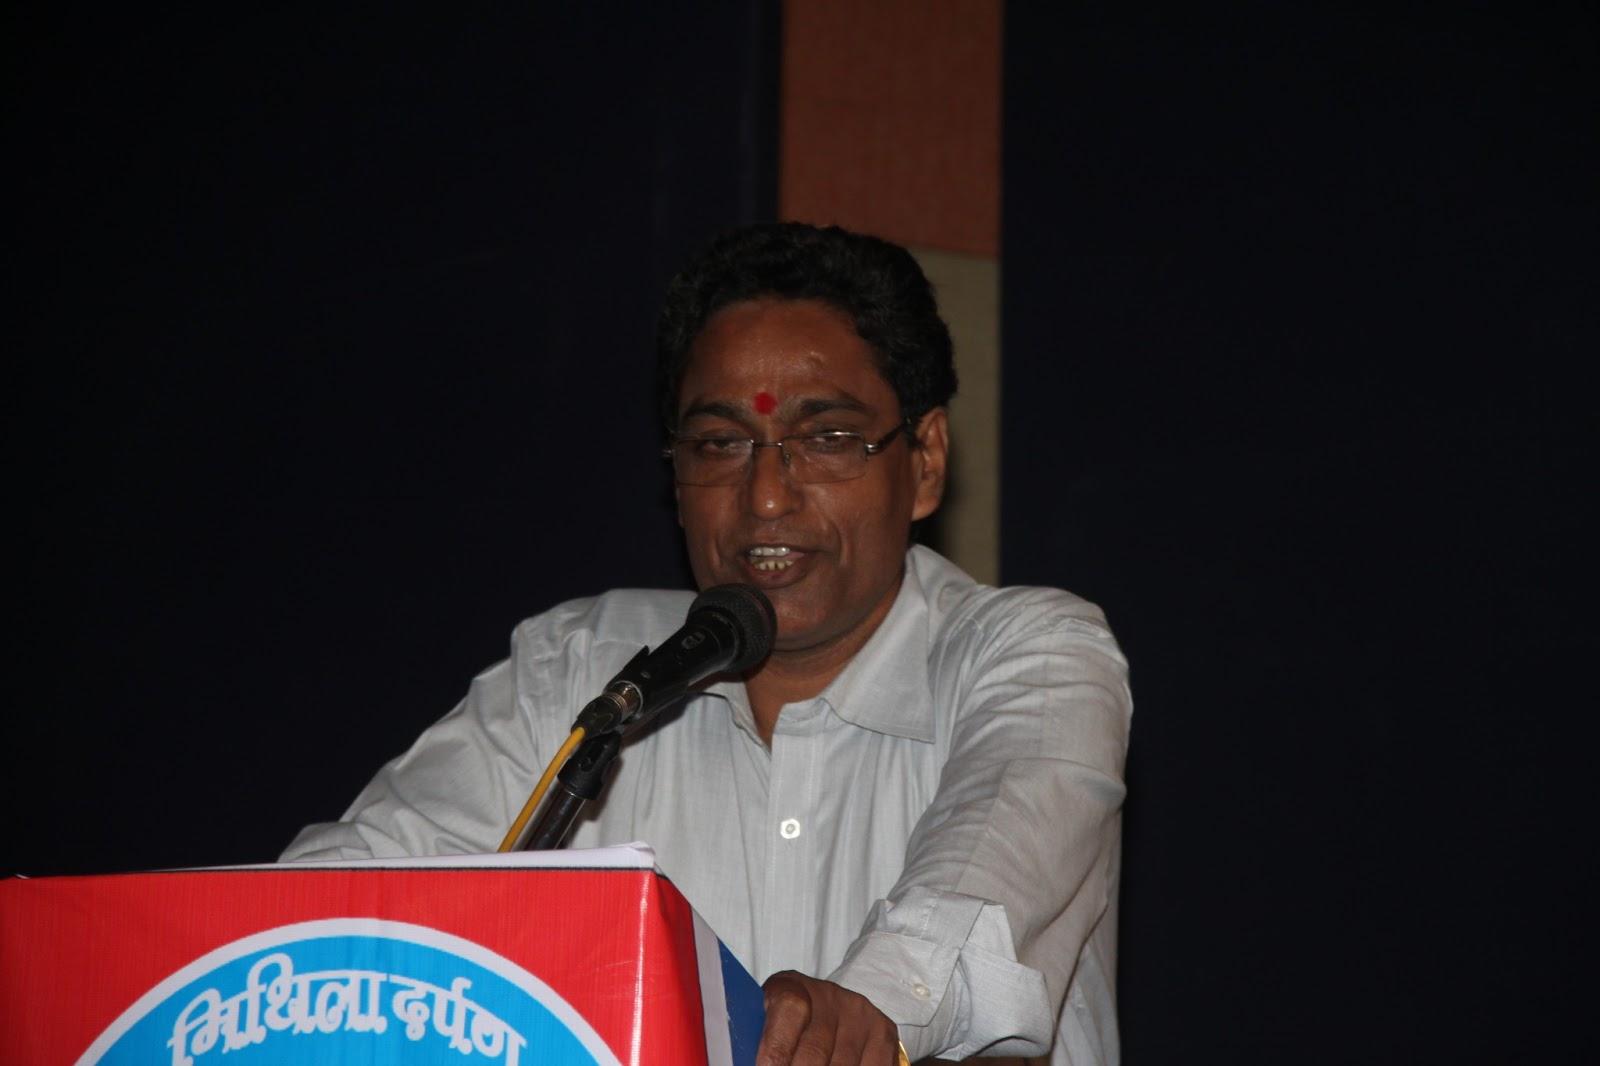 krishna kumar jha , pro.kkanveshk . mithiladarpan , mithila , maithili